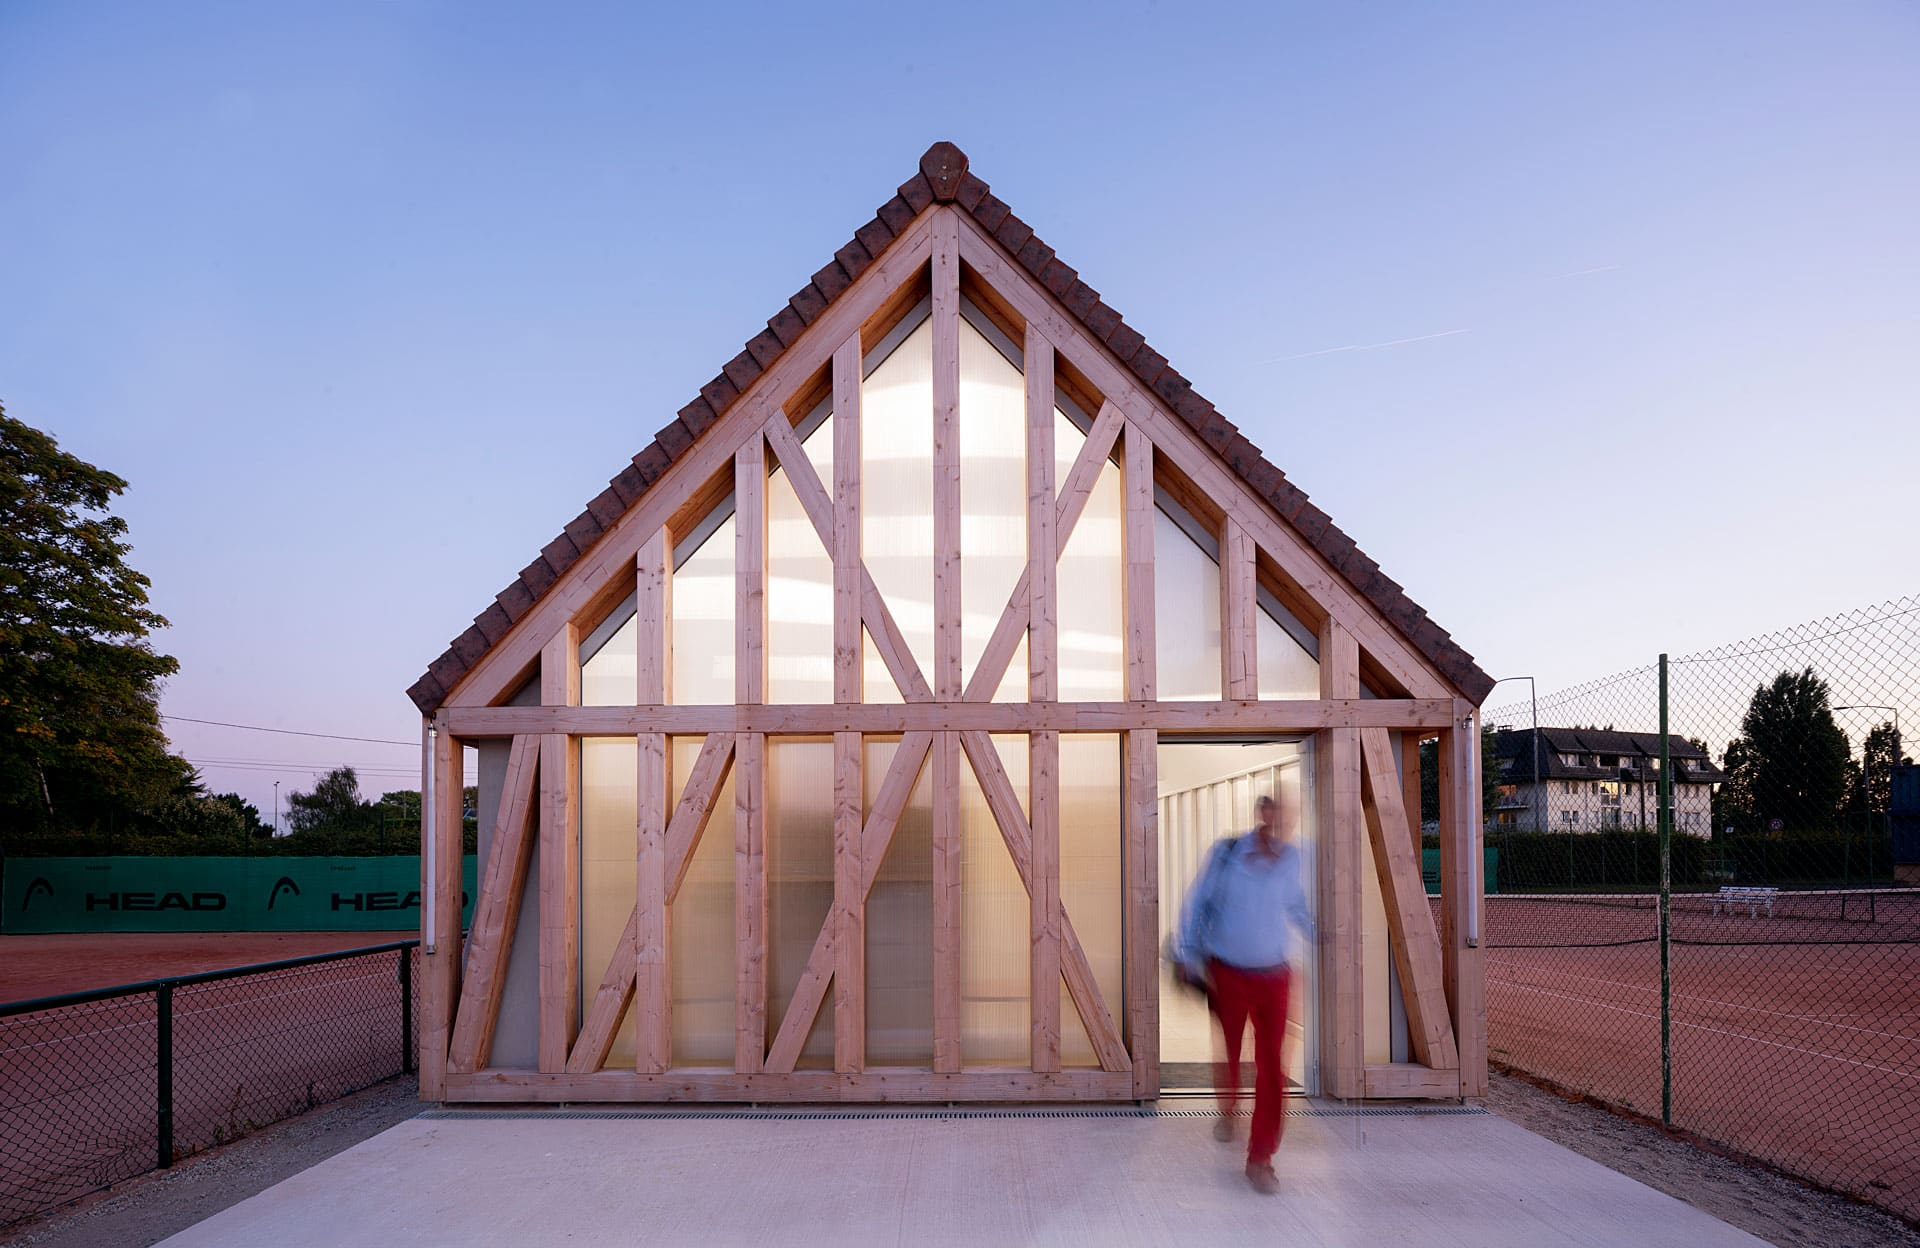 Garden Tennis Club of Cabourg by Lemoal Lemoal Architectes